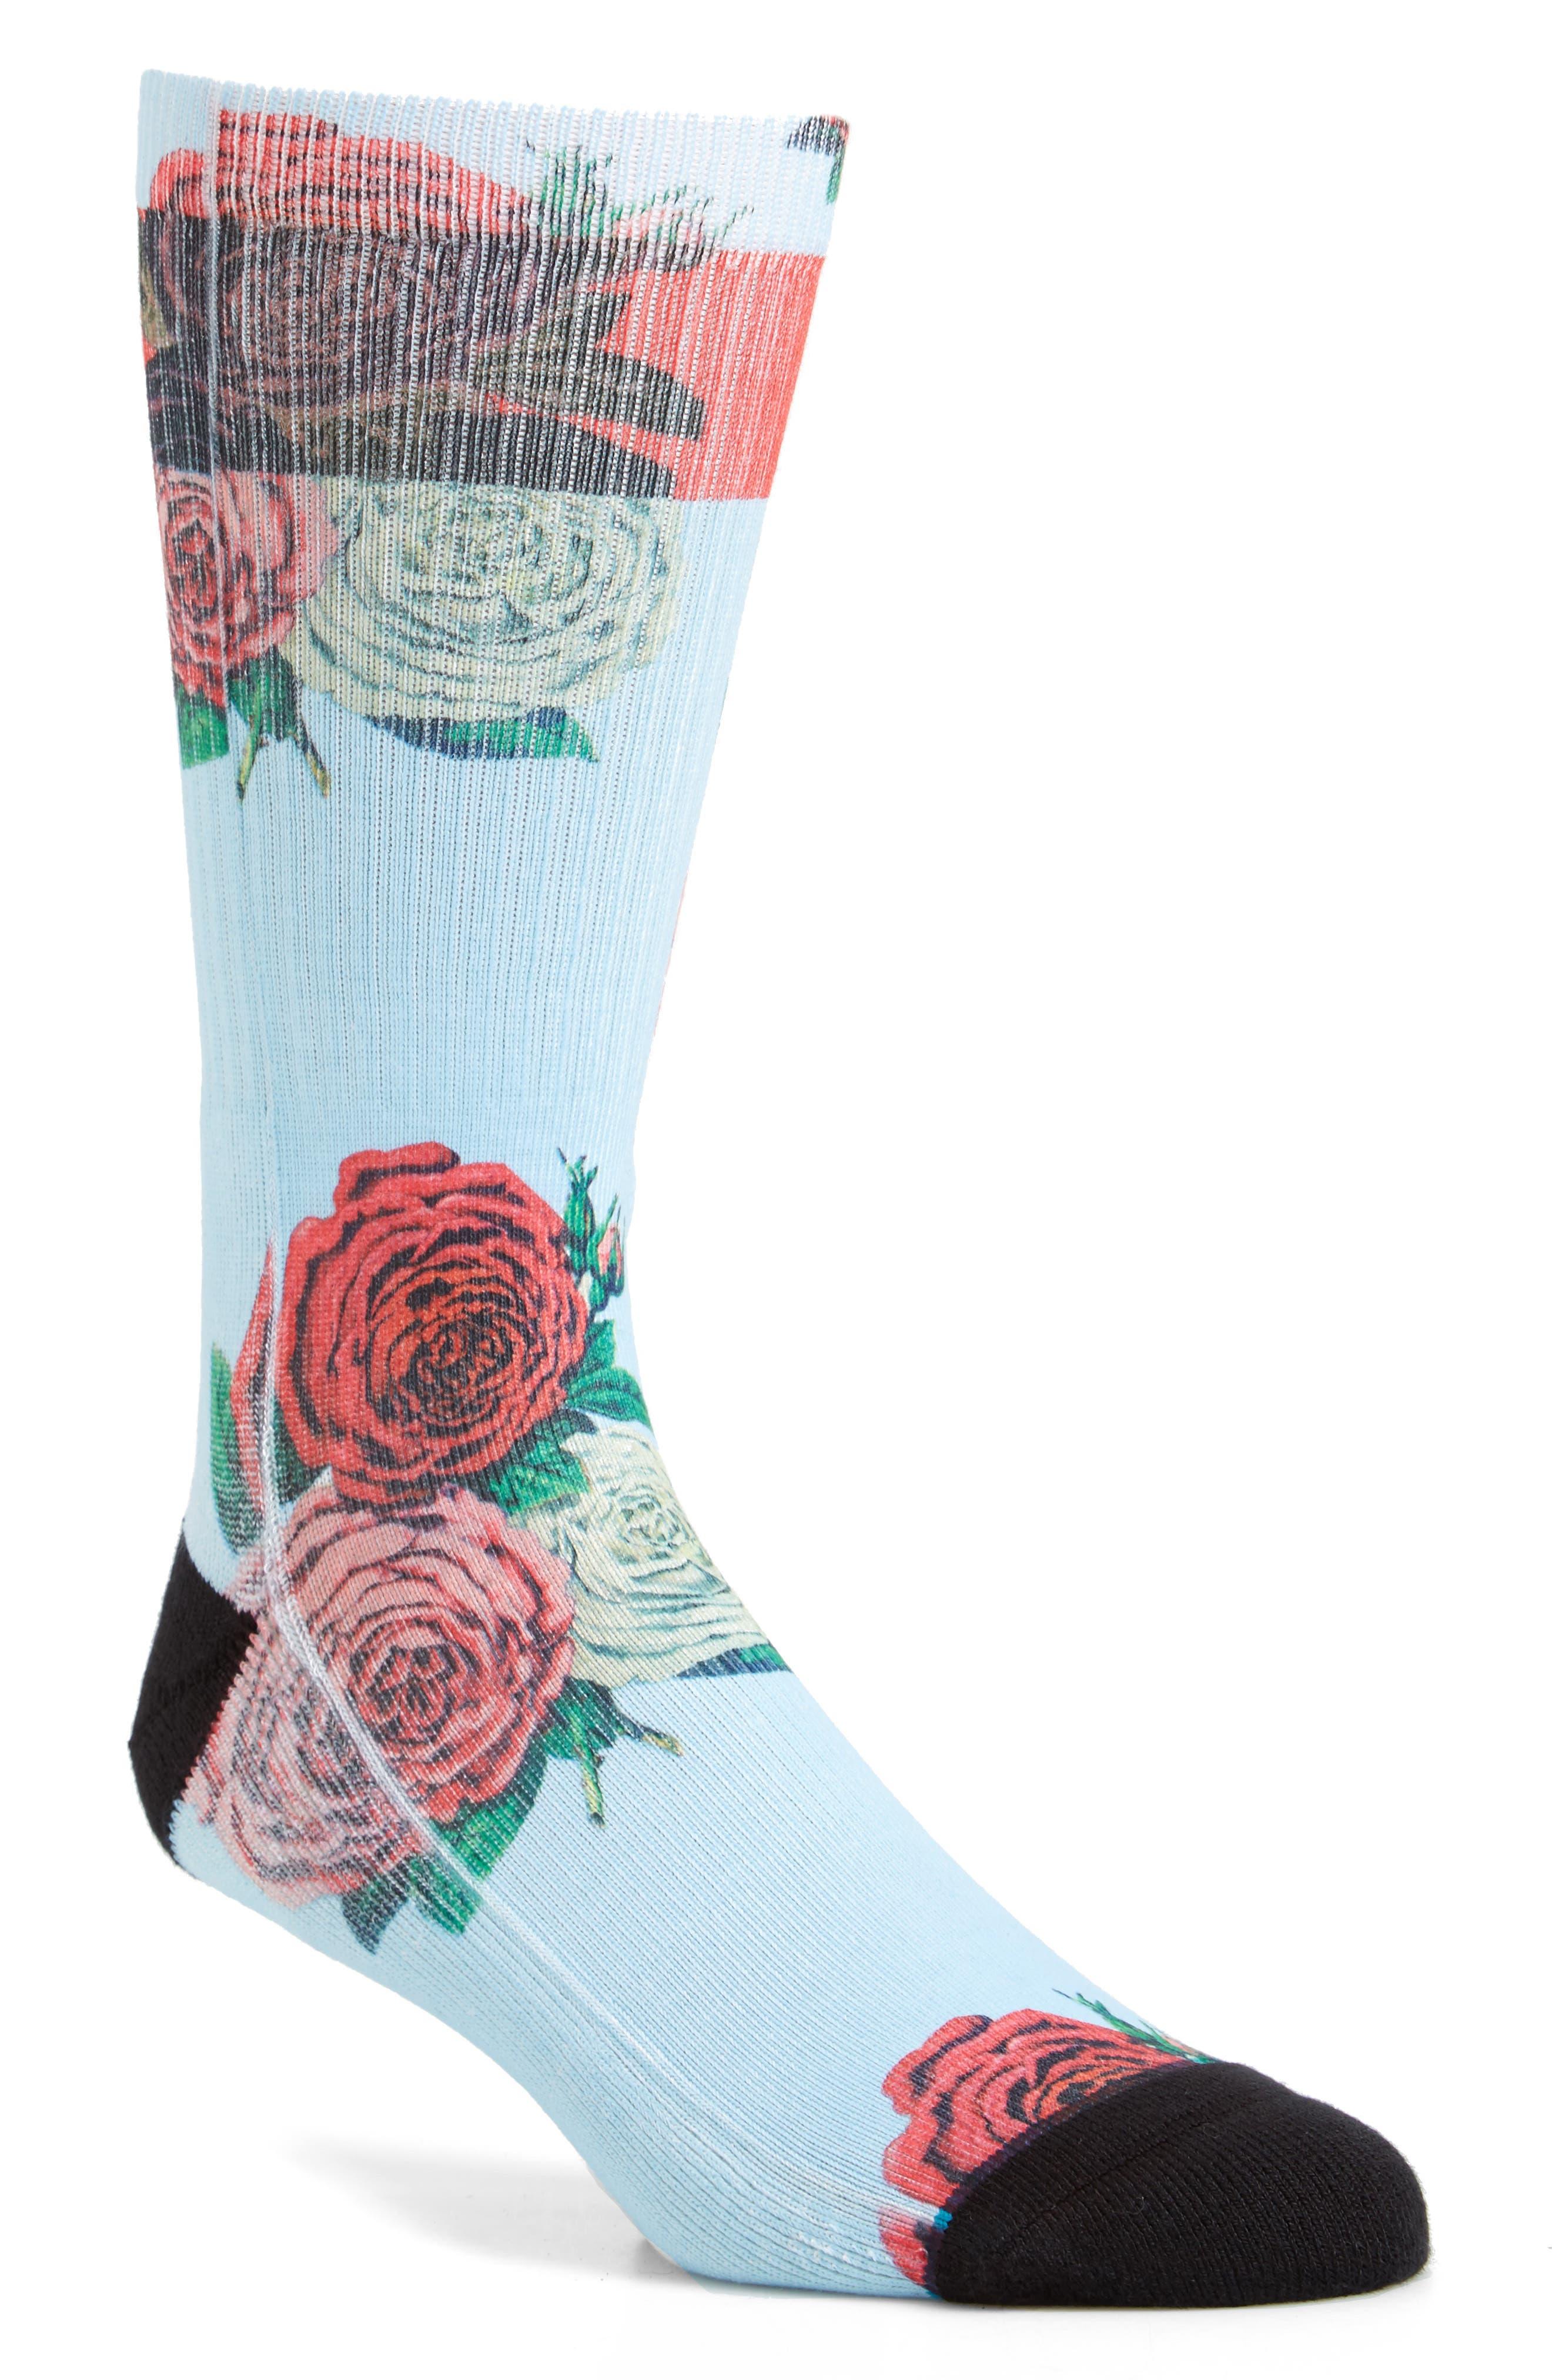 Main Image - Stance Libertine Rose Crew Socks